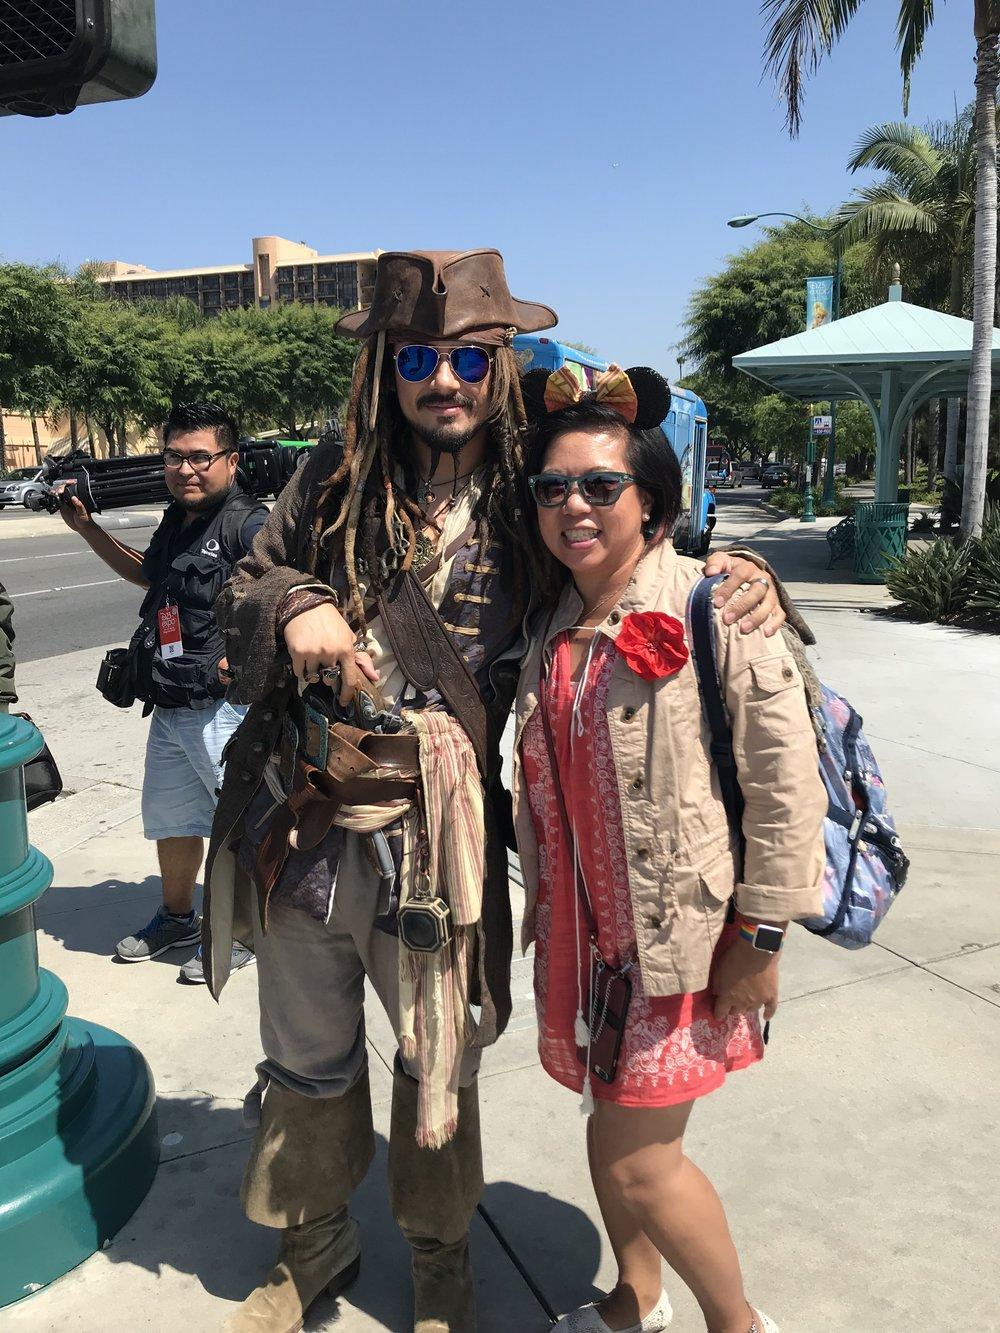 Jack Sparrow & Me